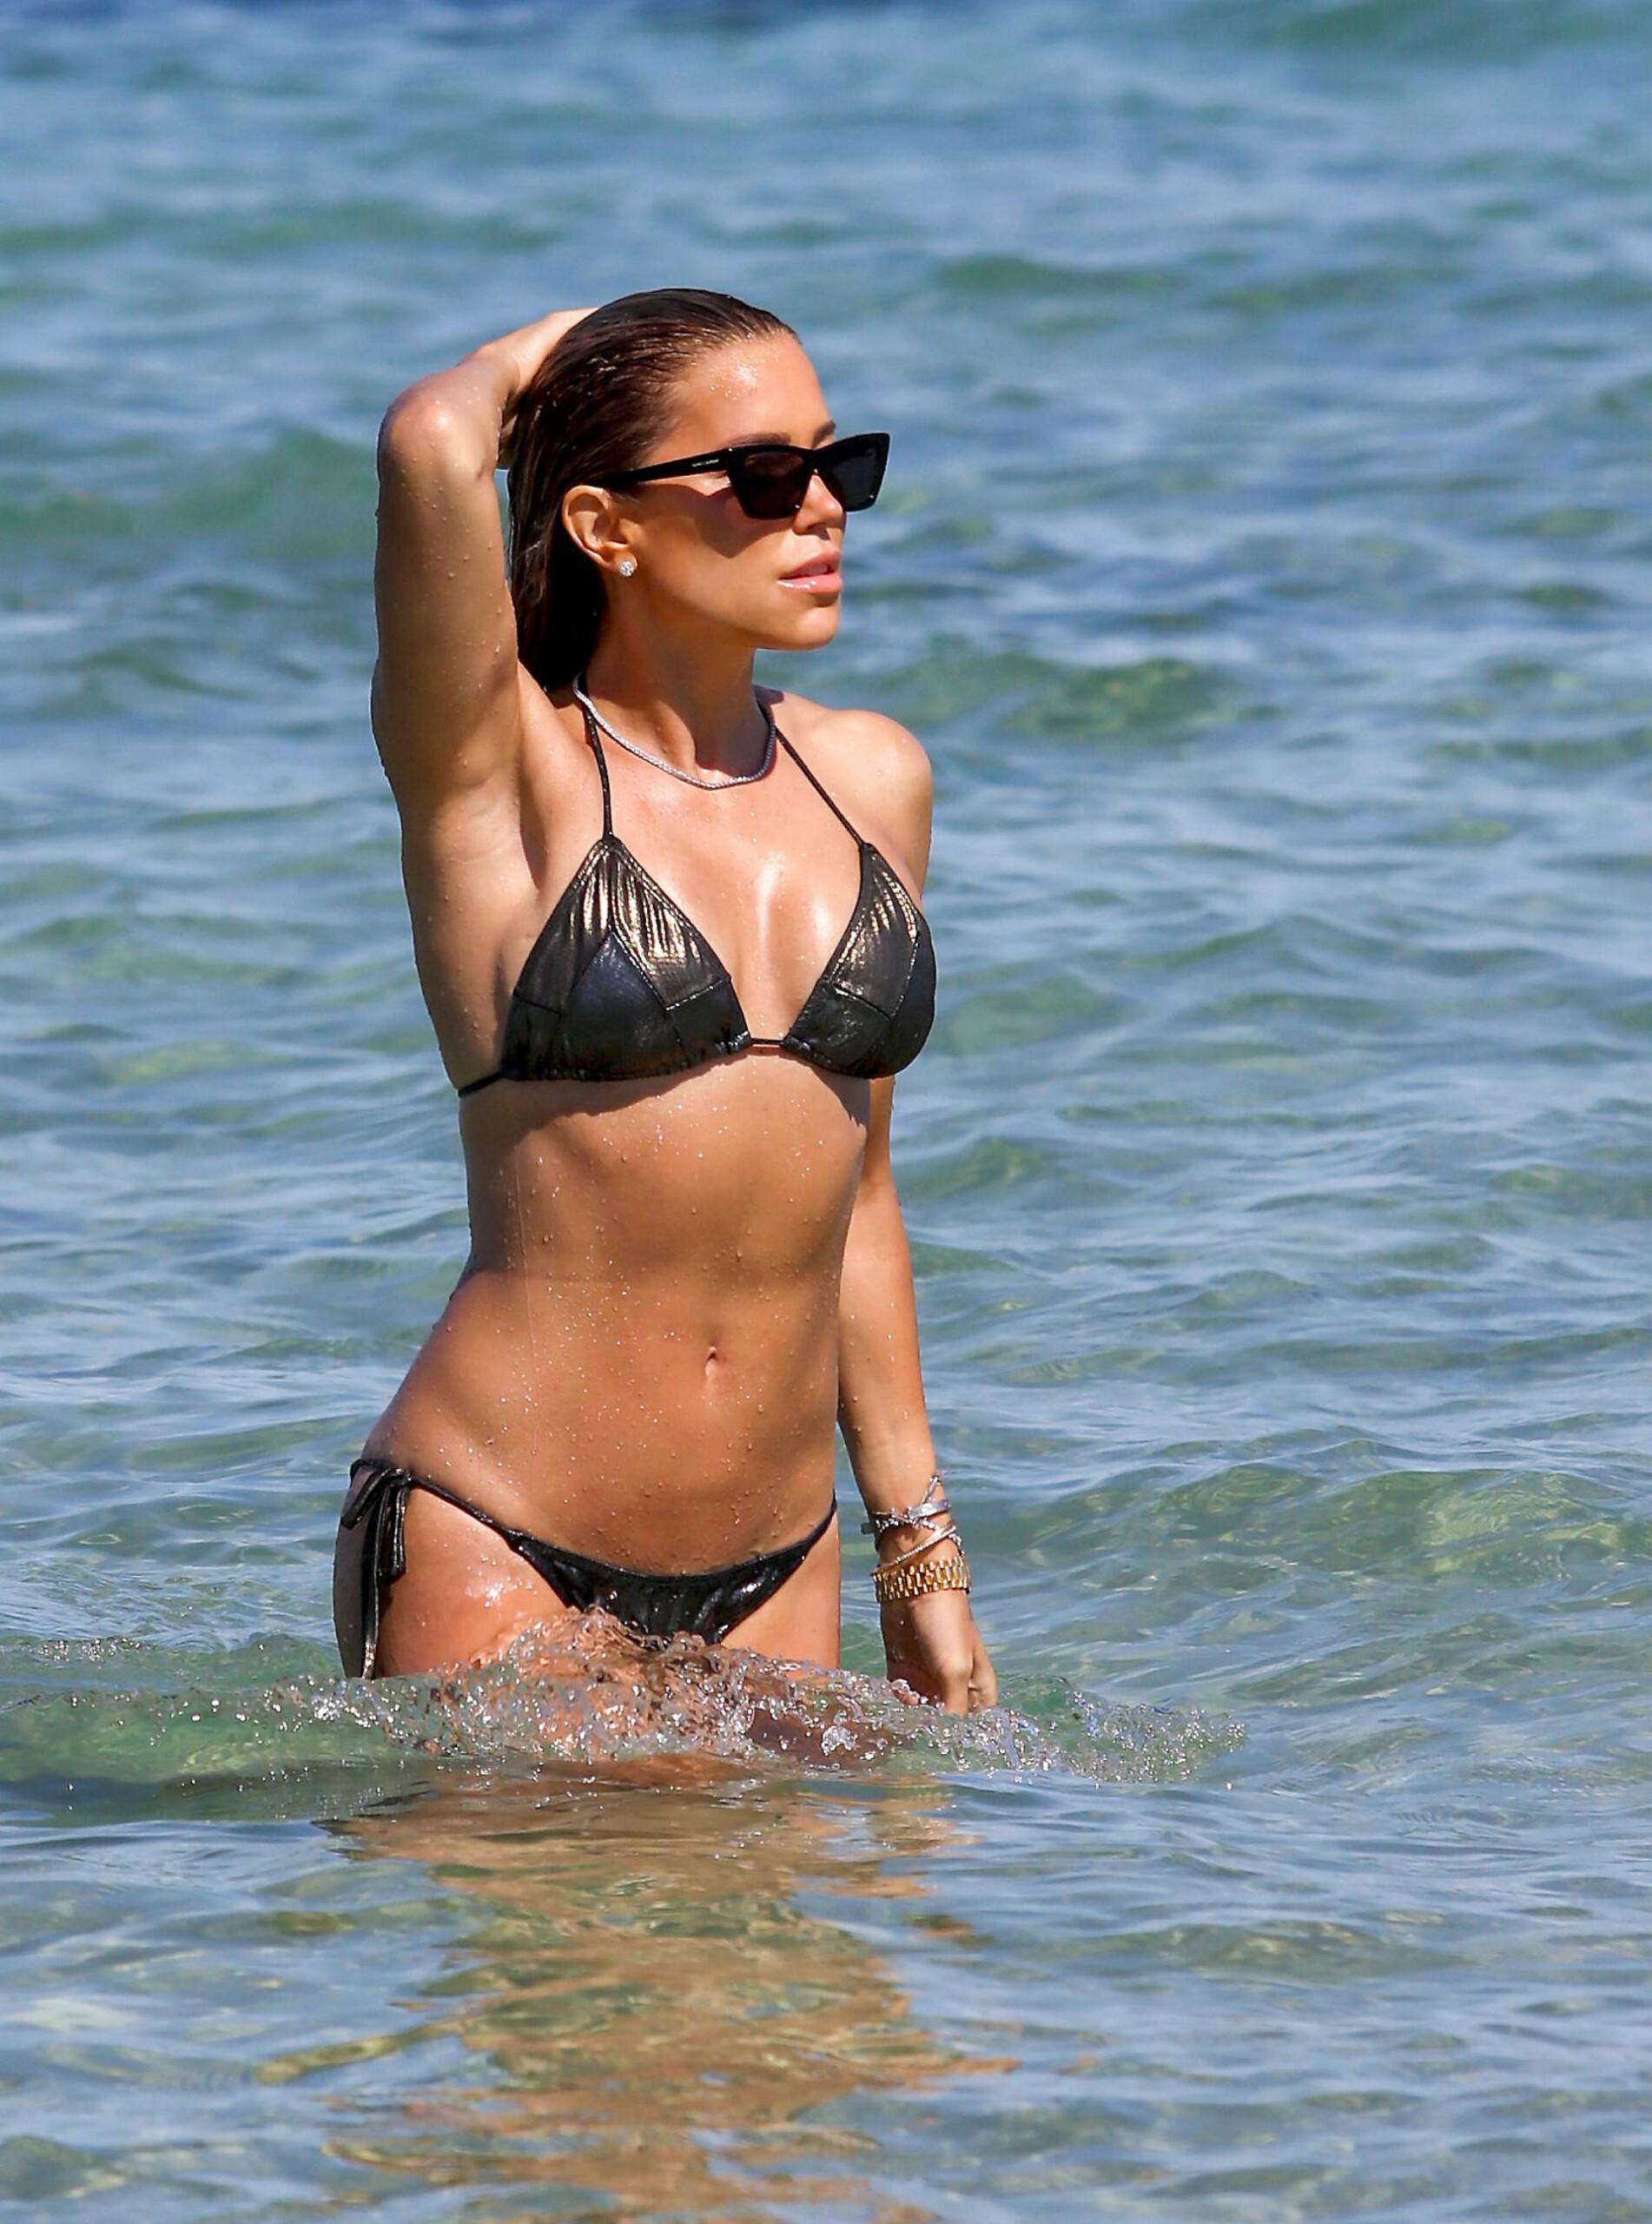 Sylvie Meis – Sexy Boobs In Bikini On The Beach In Saint Tropez 0005